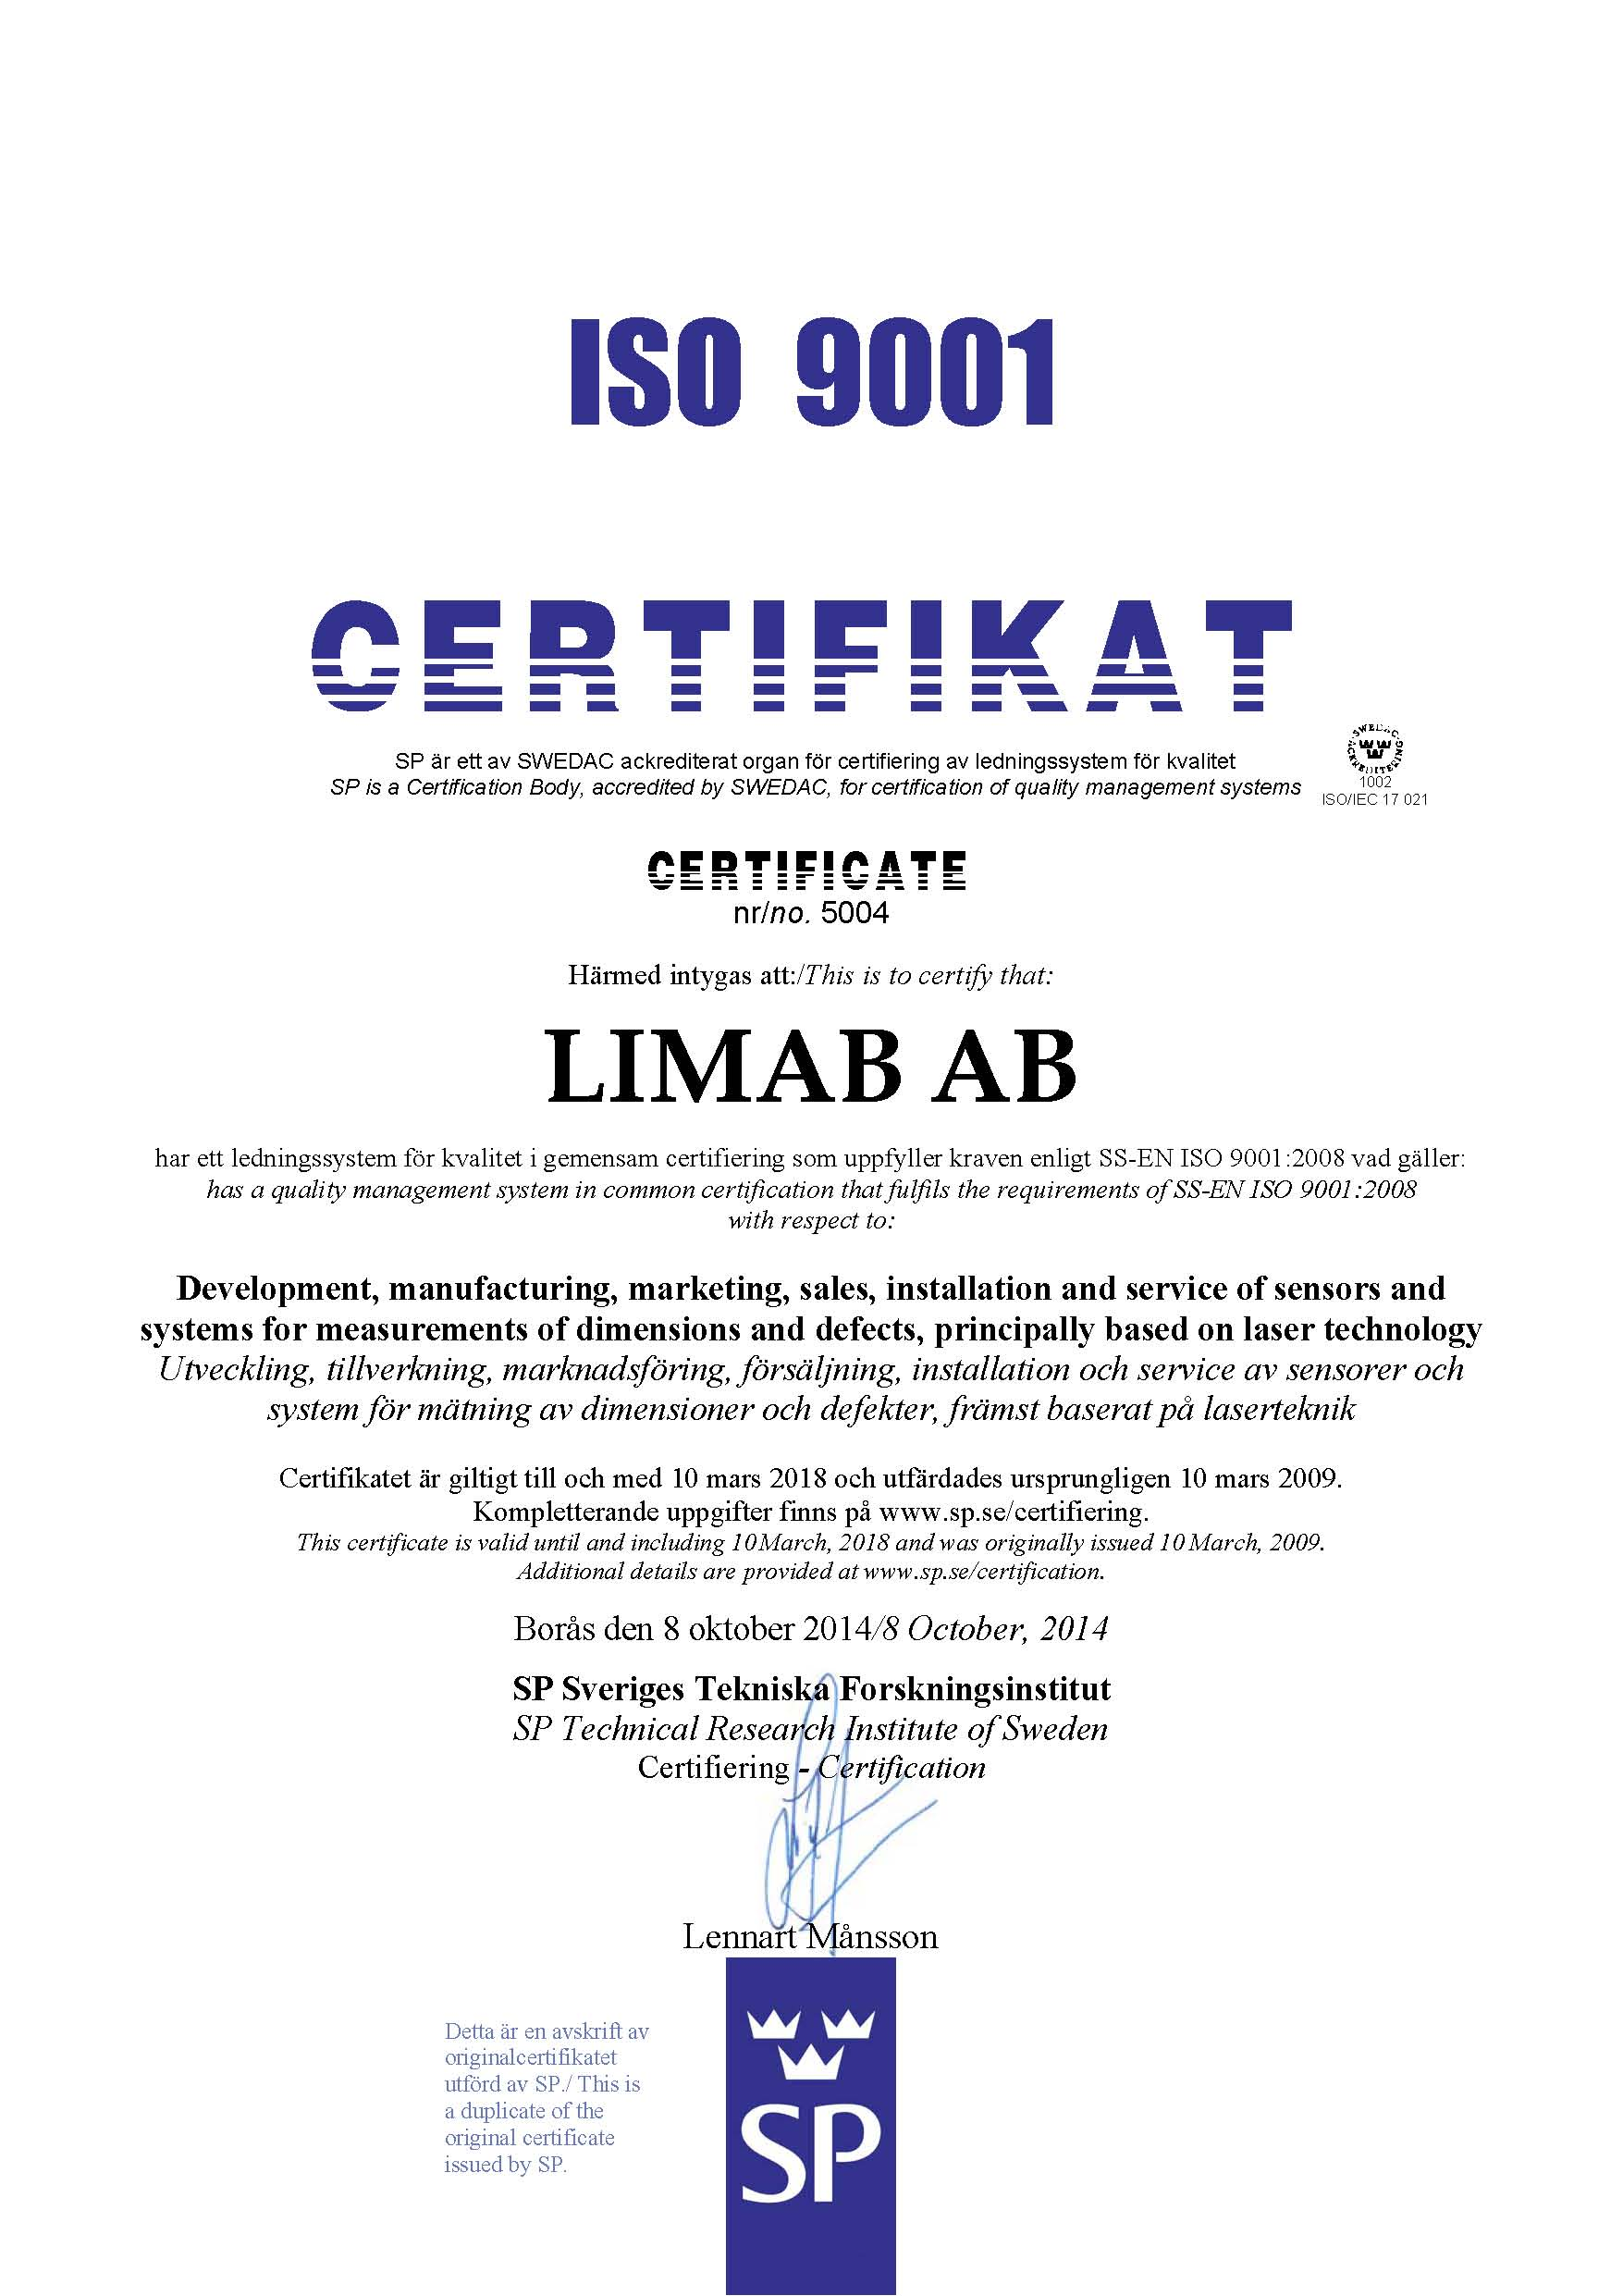 LIMAB ISO 9001 certifikat